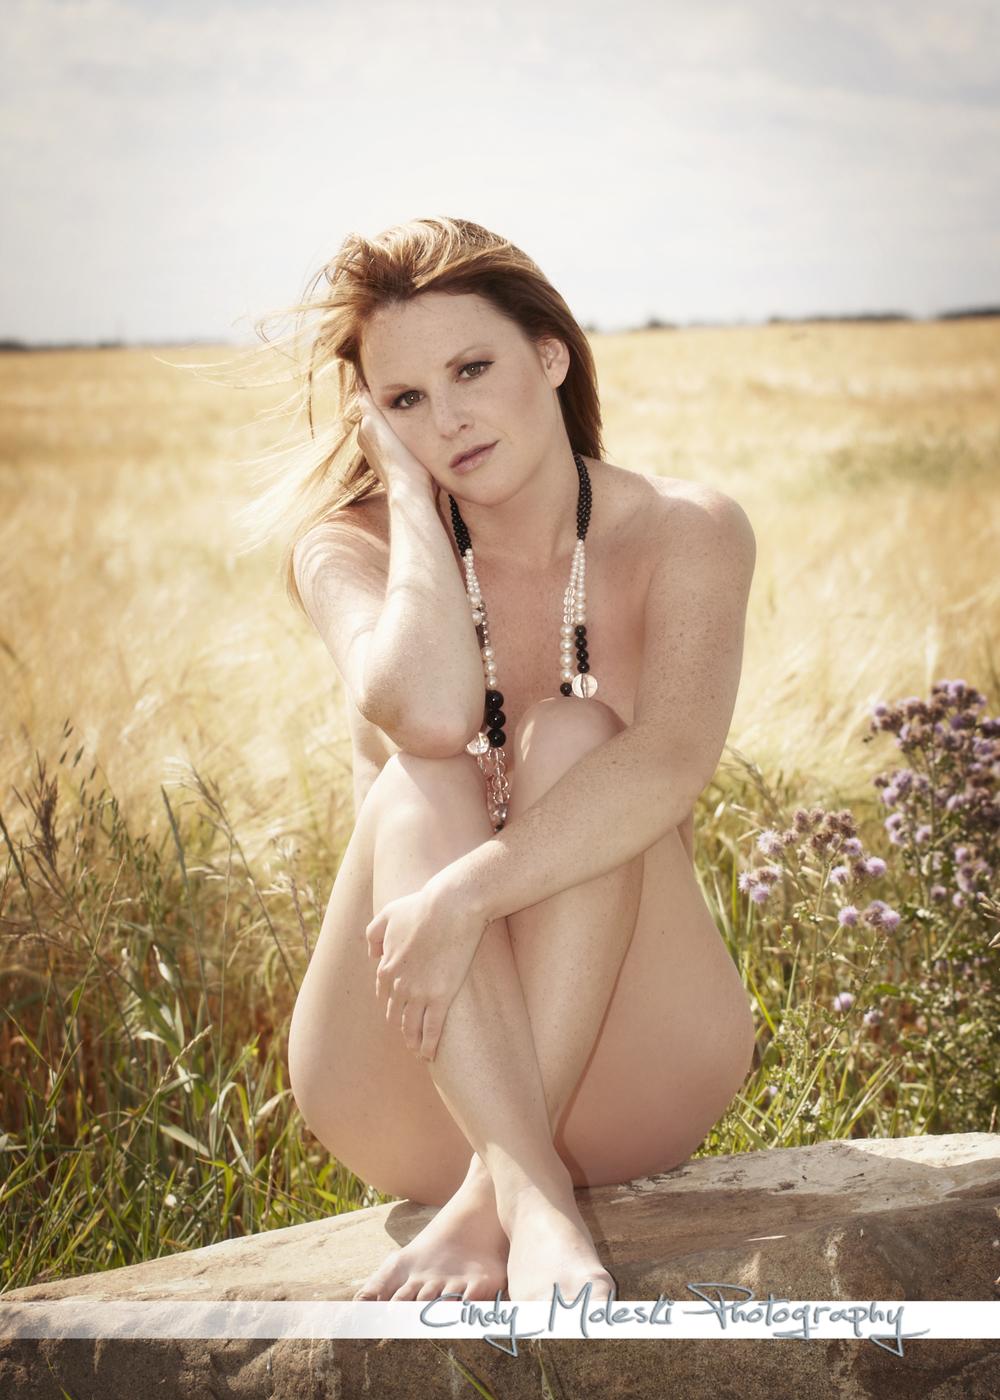 professional-boudoir-photographer-cindy-moleski-Pulver10C9805blog.jpg